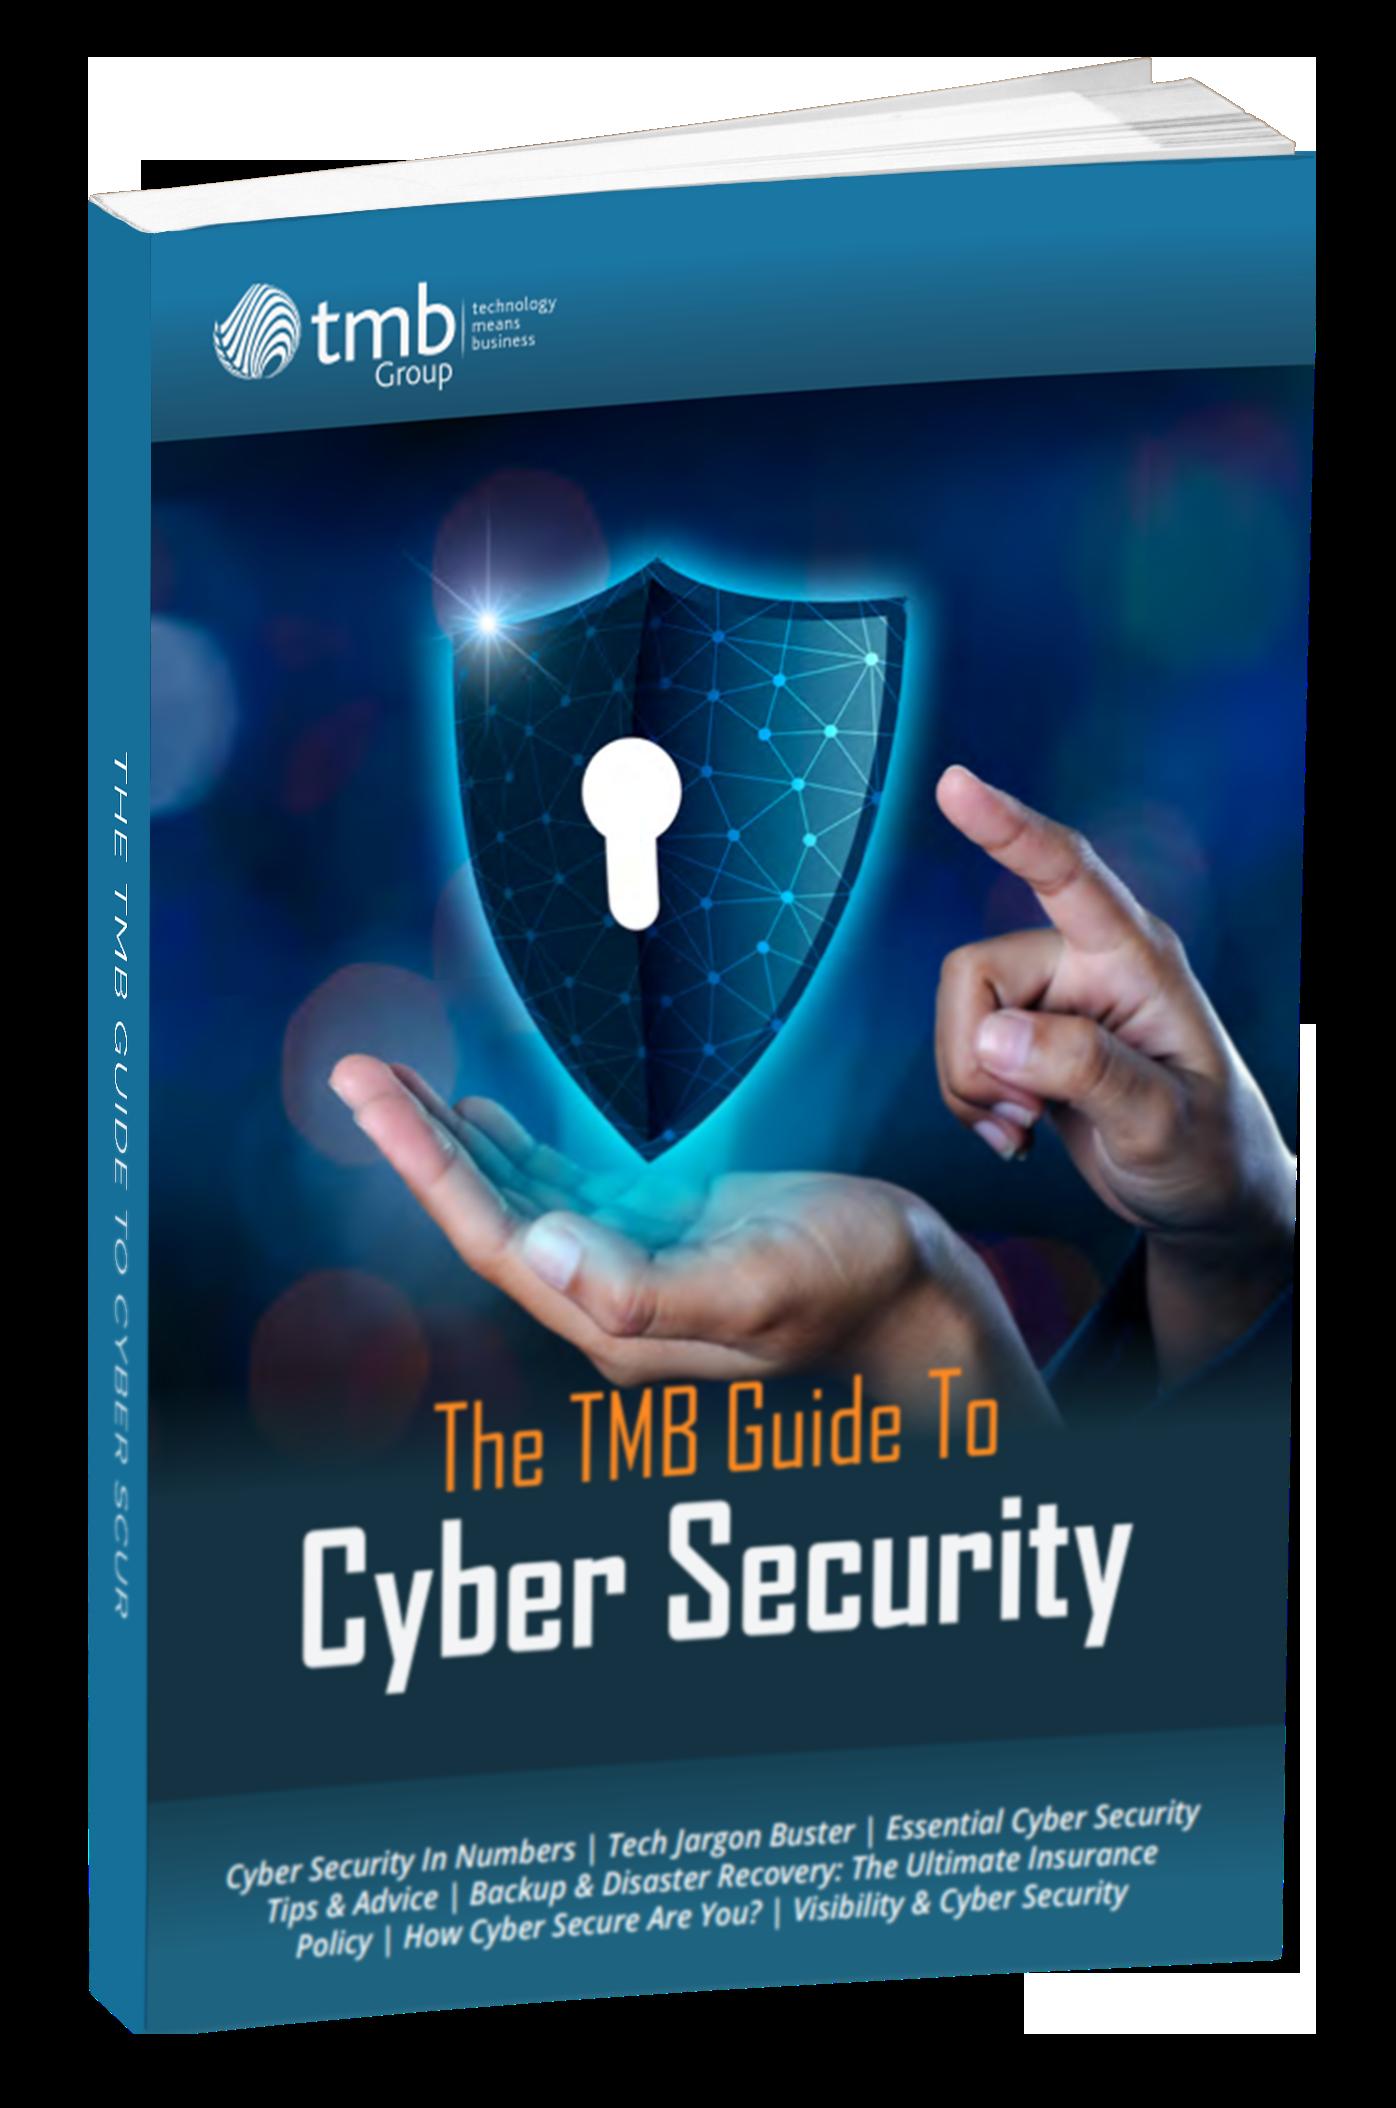 TMB-CyberSecurity Guide-MockUp